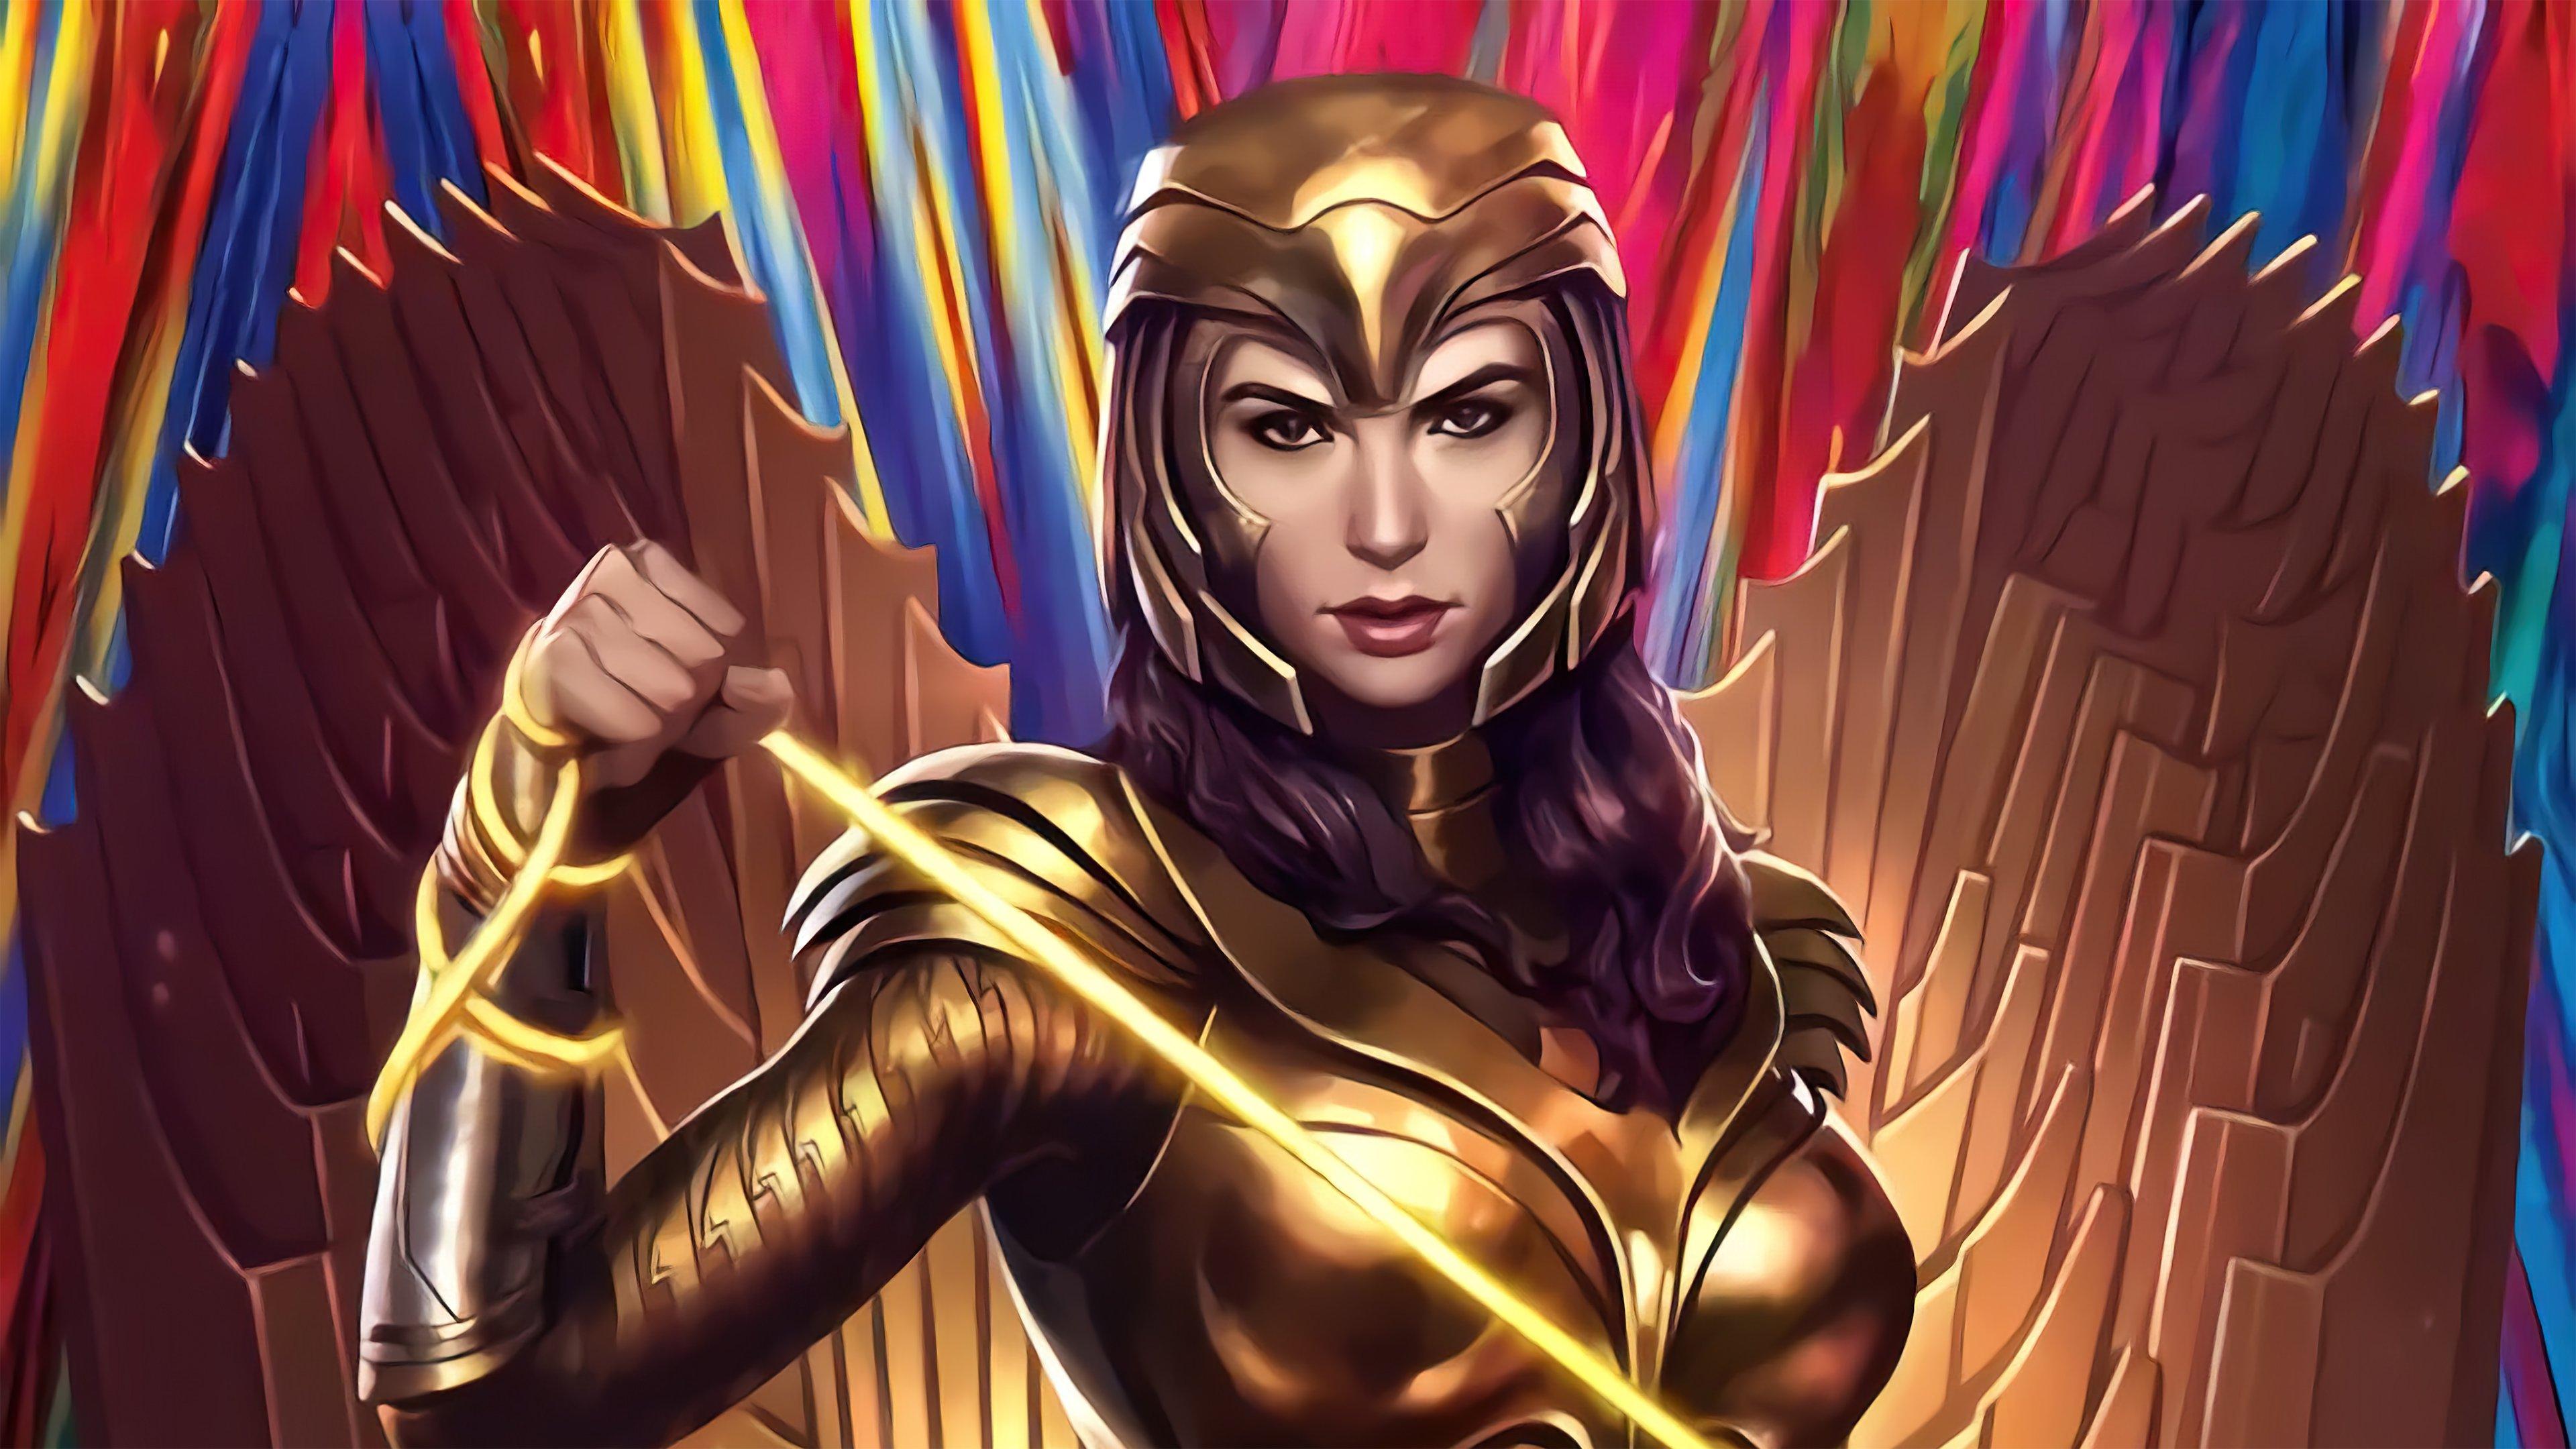 Wallpaper Injustice Wonder Woman Gold suit